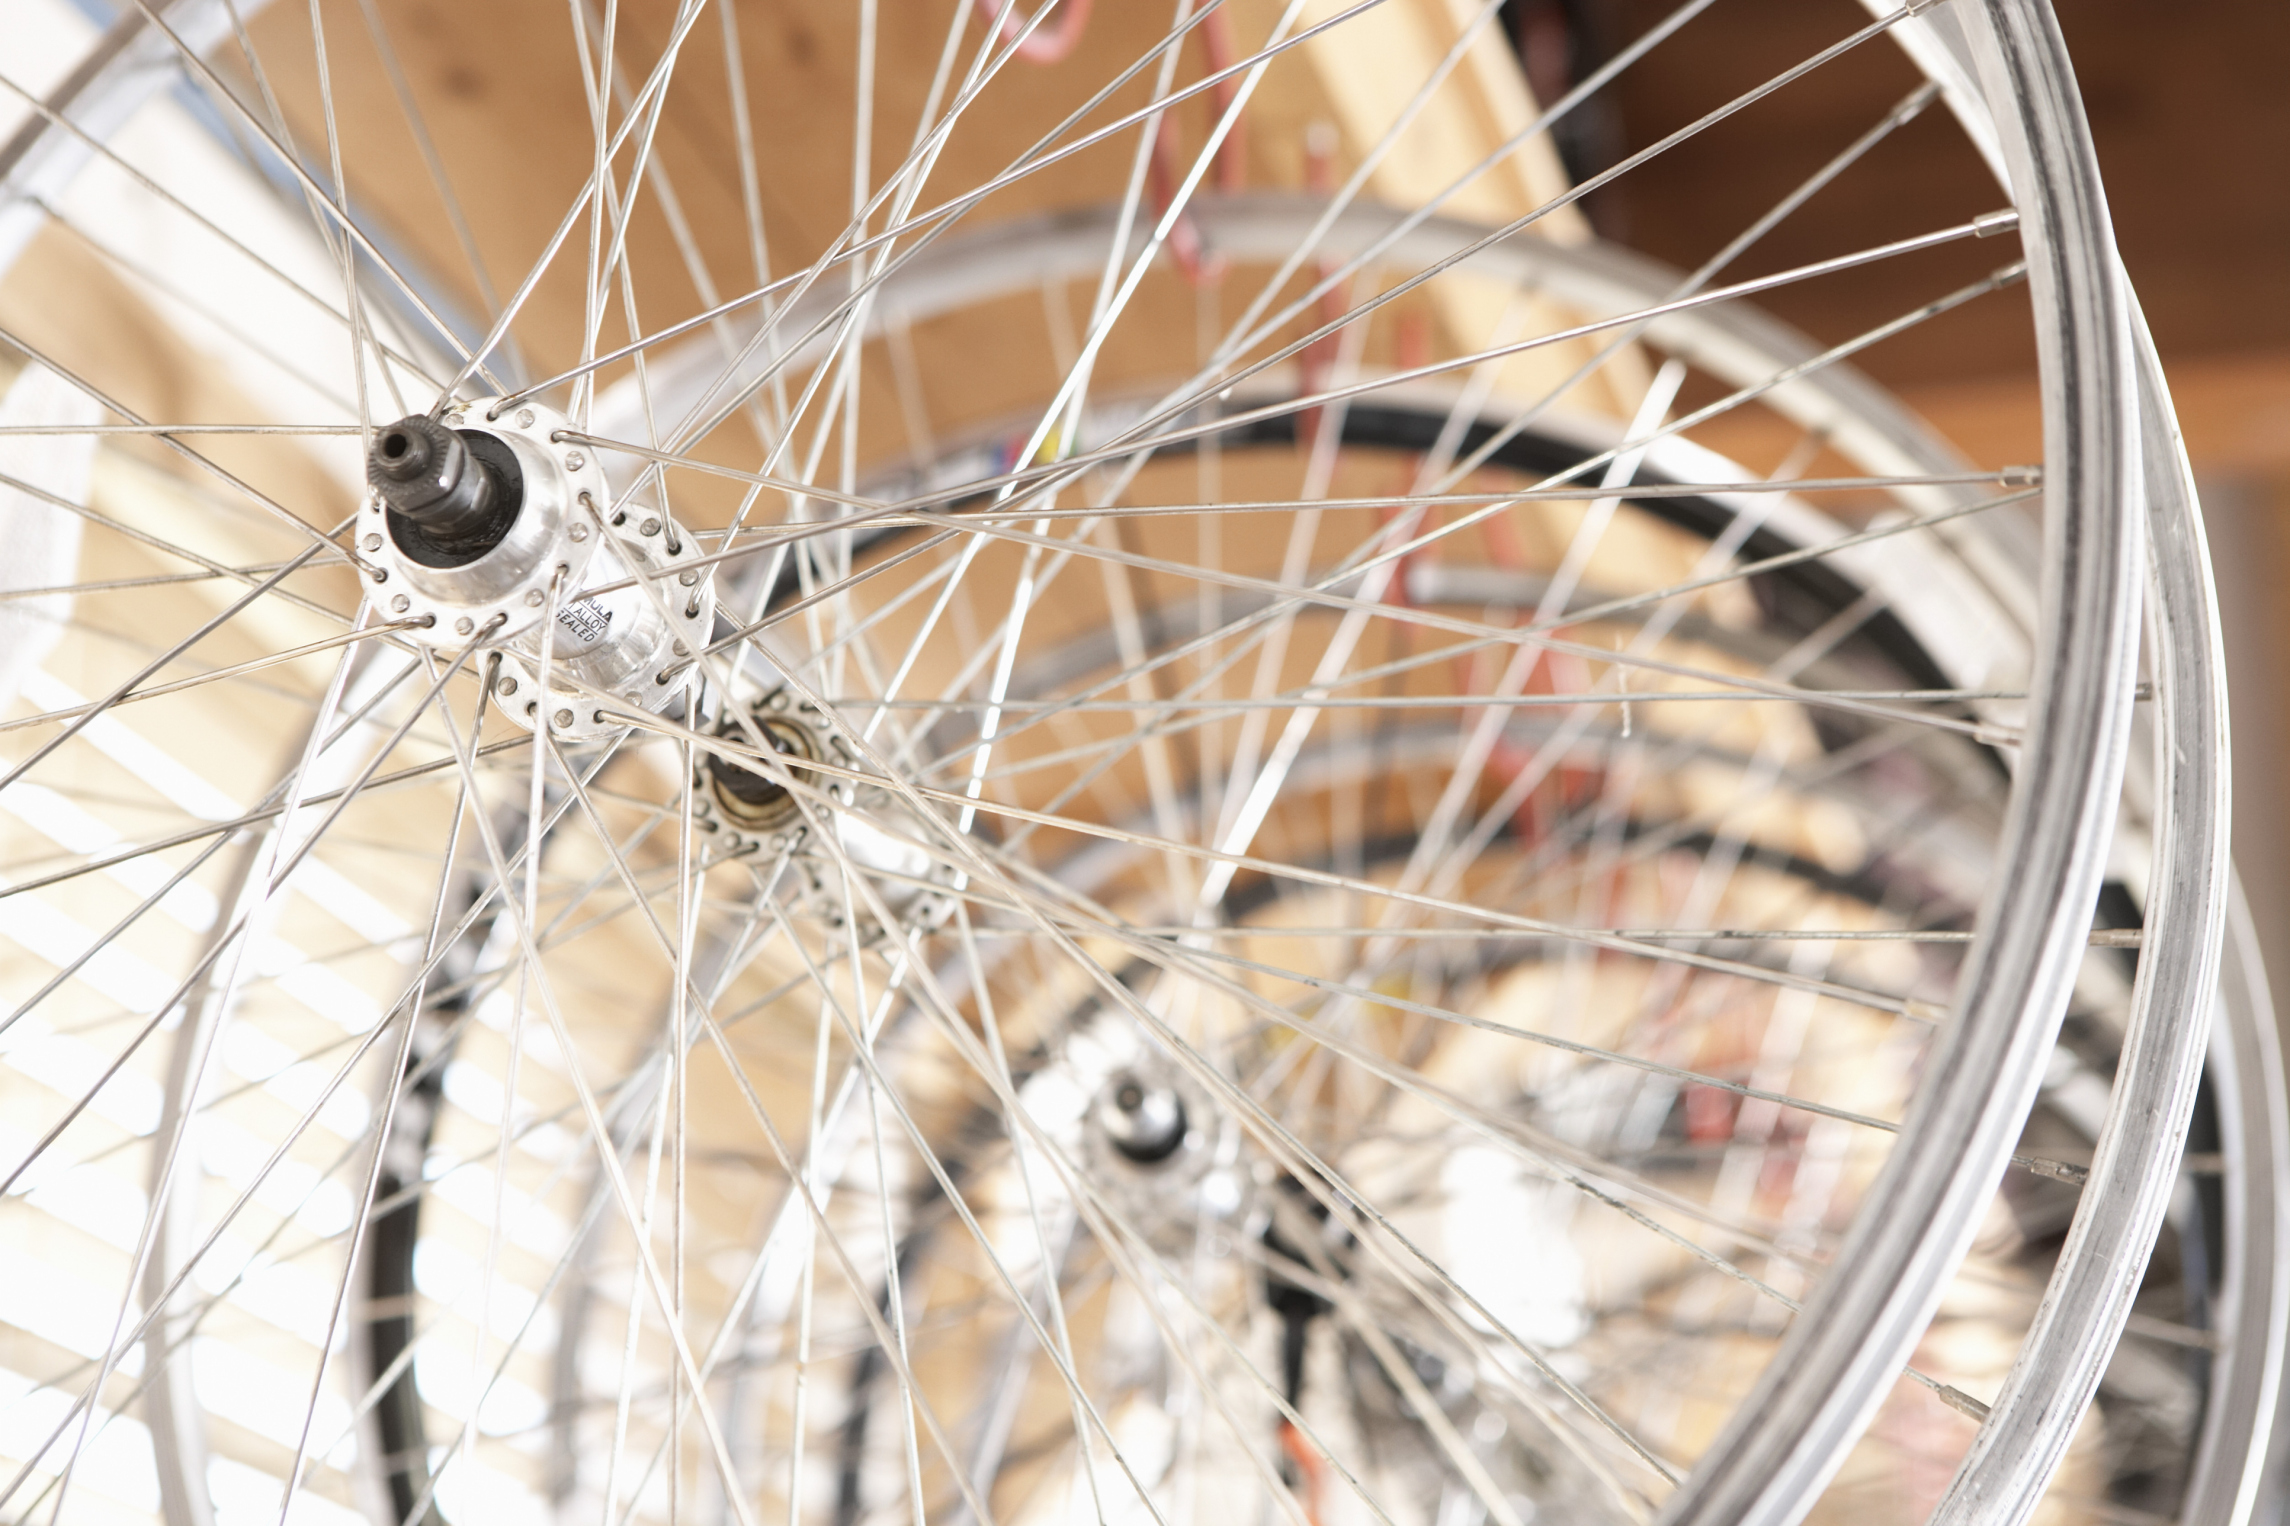 How to Adjust Trek Bicycle Bars